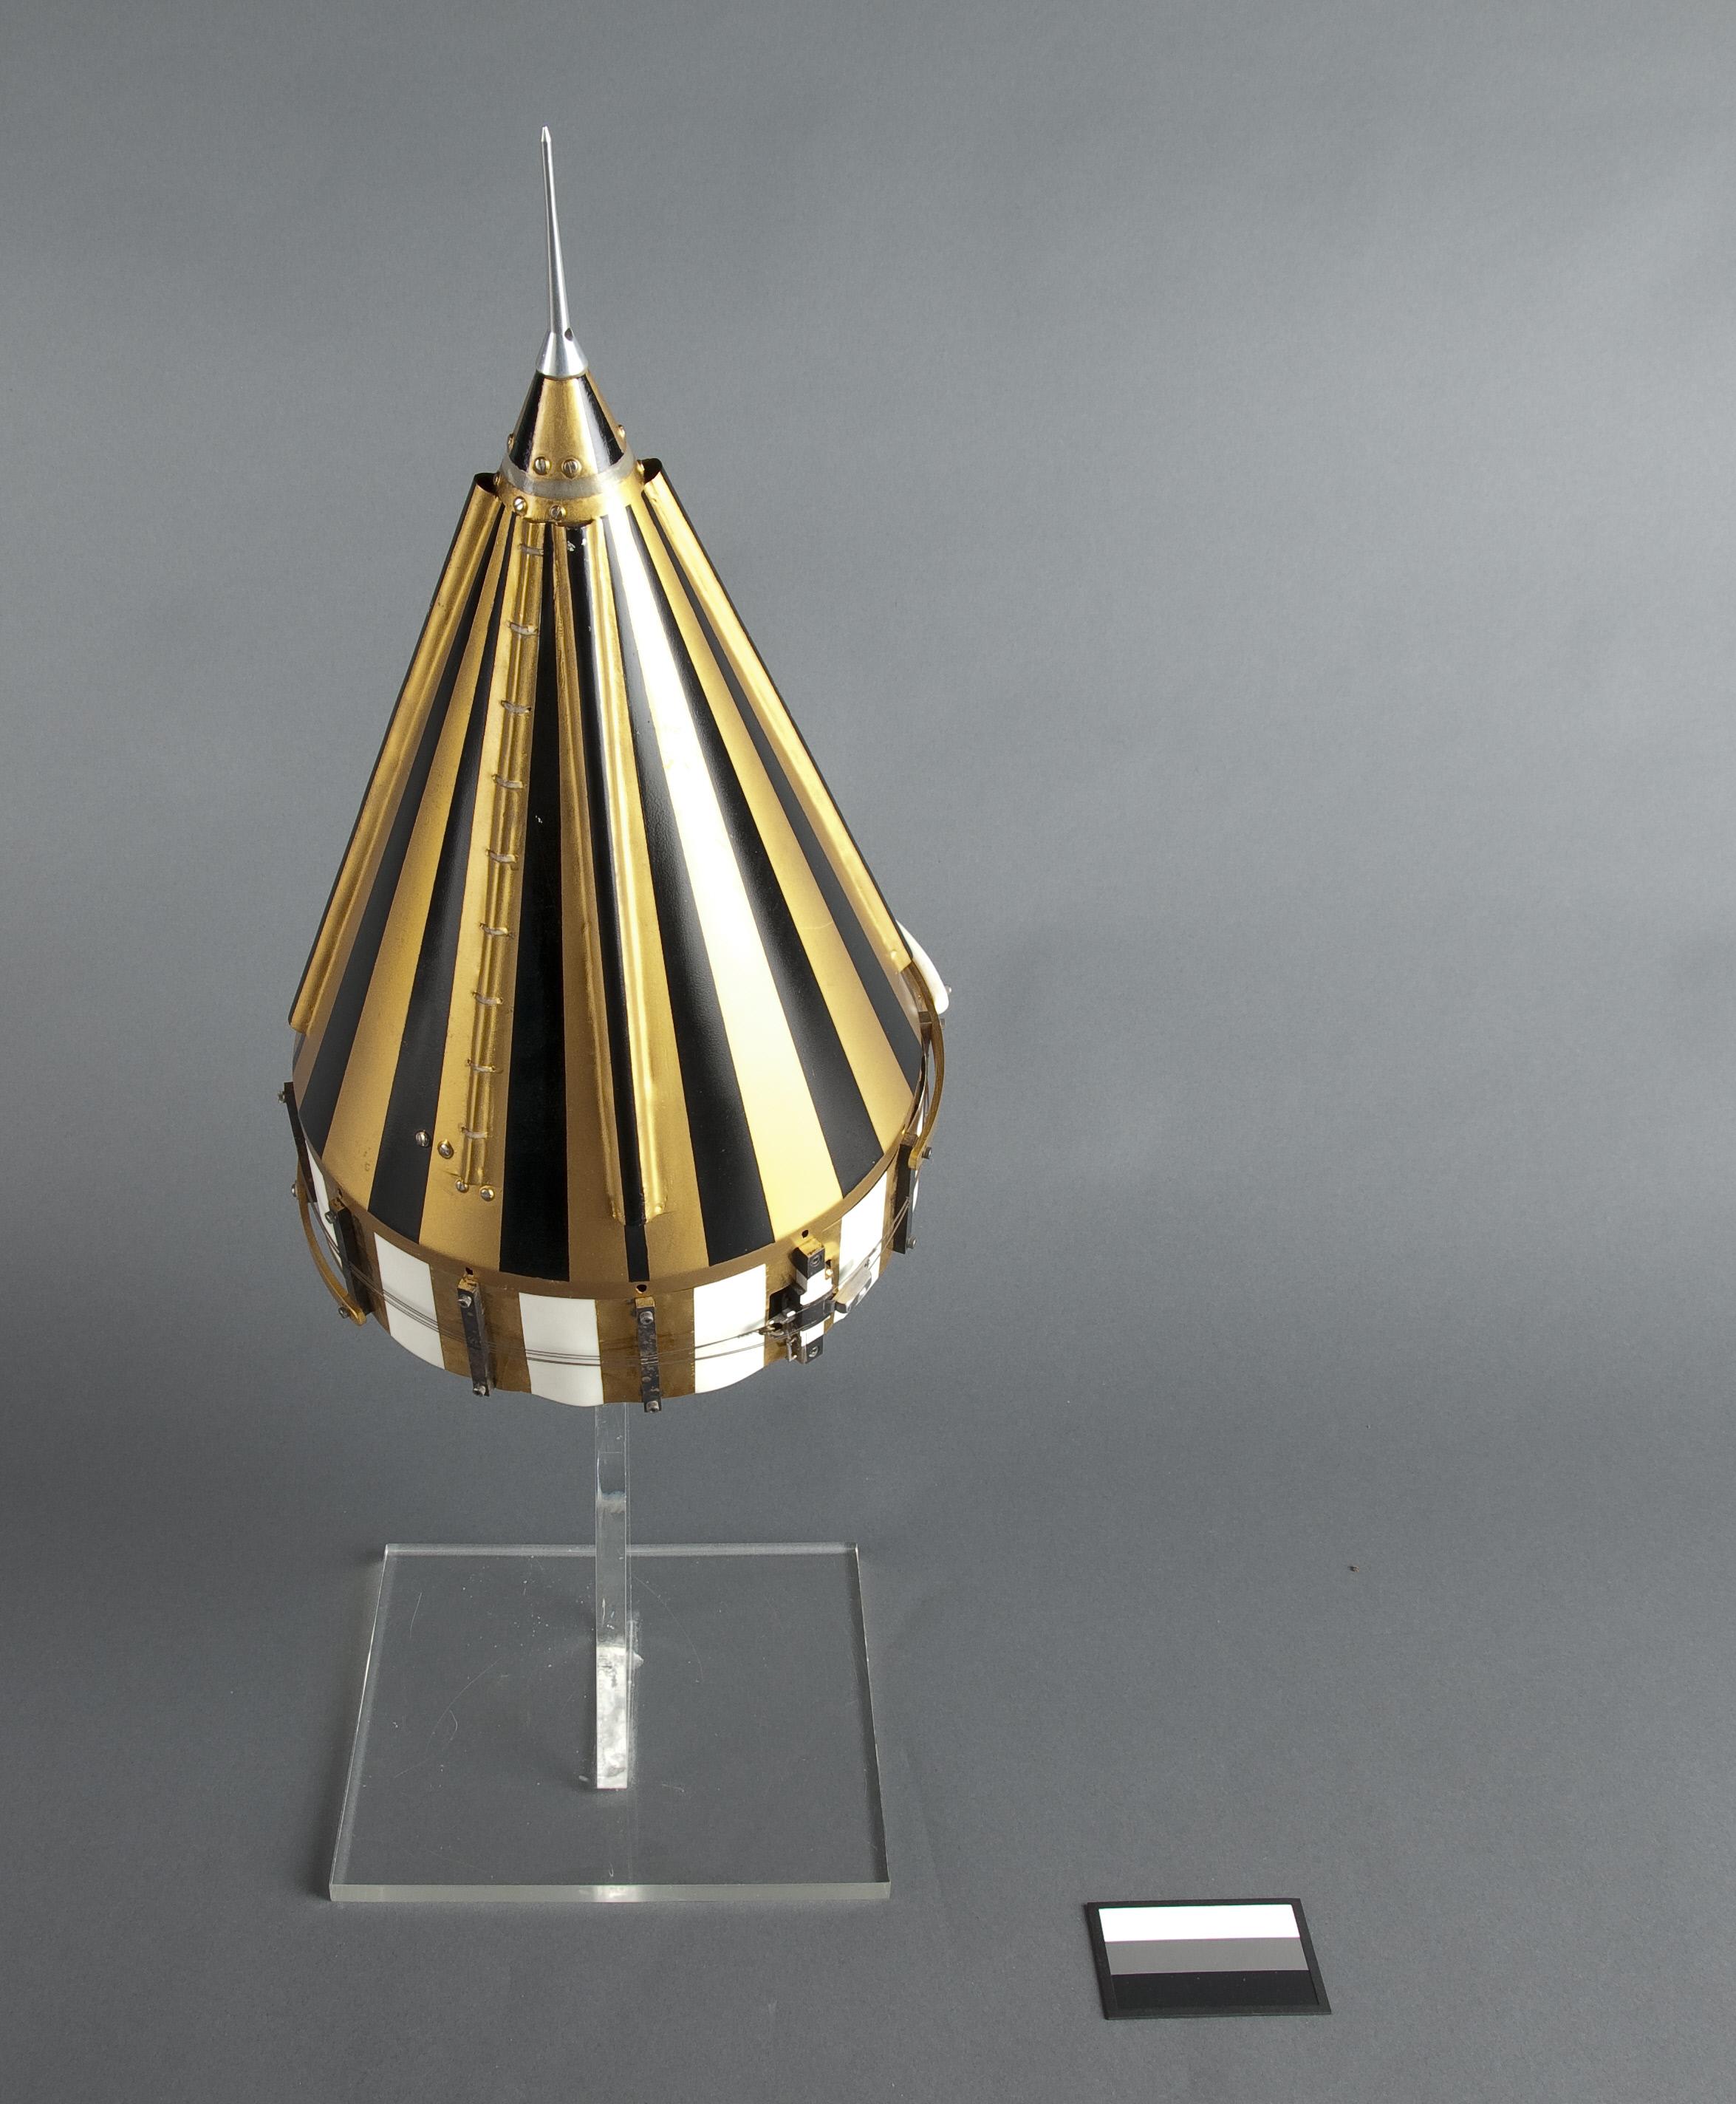 Image of : Satellite, Pioneer IV